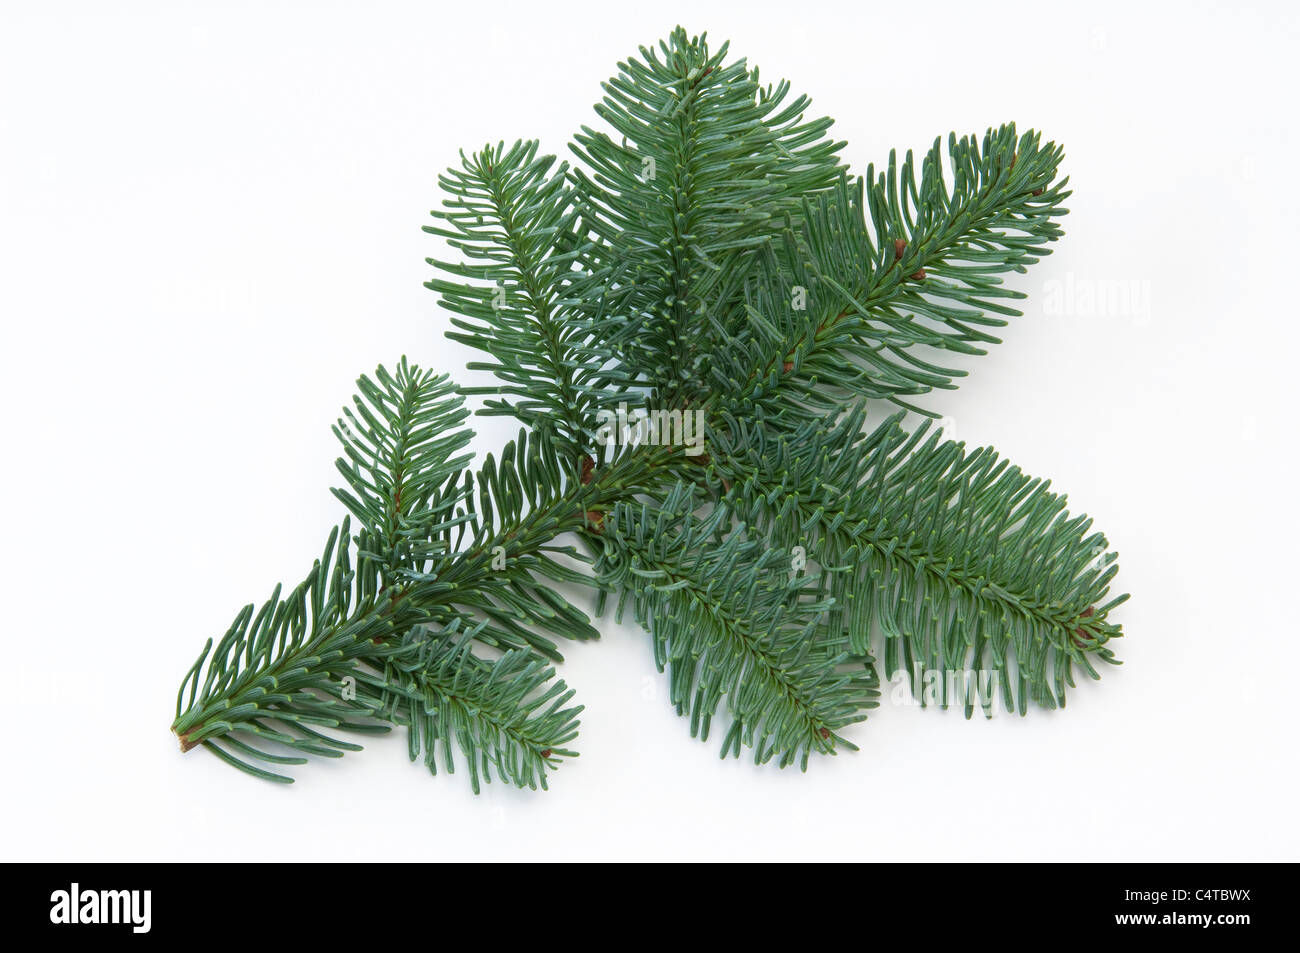 Noble Fir (Abies procera, Abies nobilis), twig. Studio shot against a white background. - Stock Image